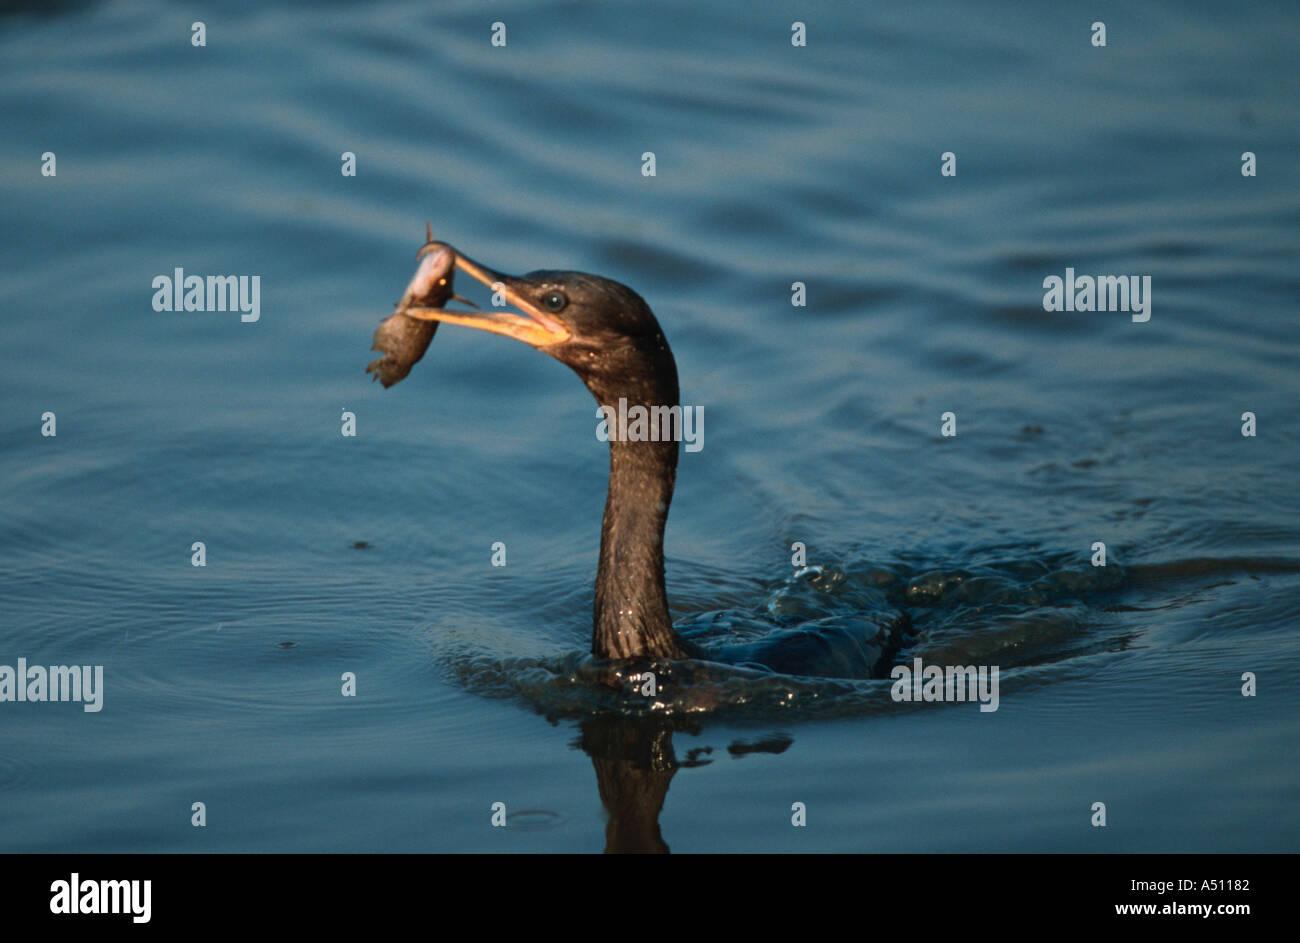 Neotropic Olivaceous cormorant Phalacrocorax olivaceus Biguá Northern Pantanal Brazil - Stock Image